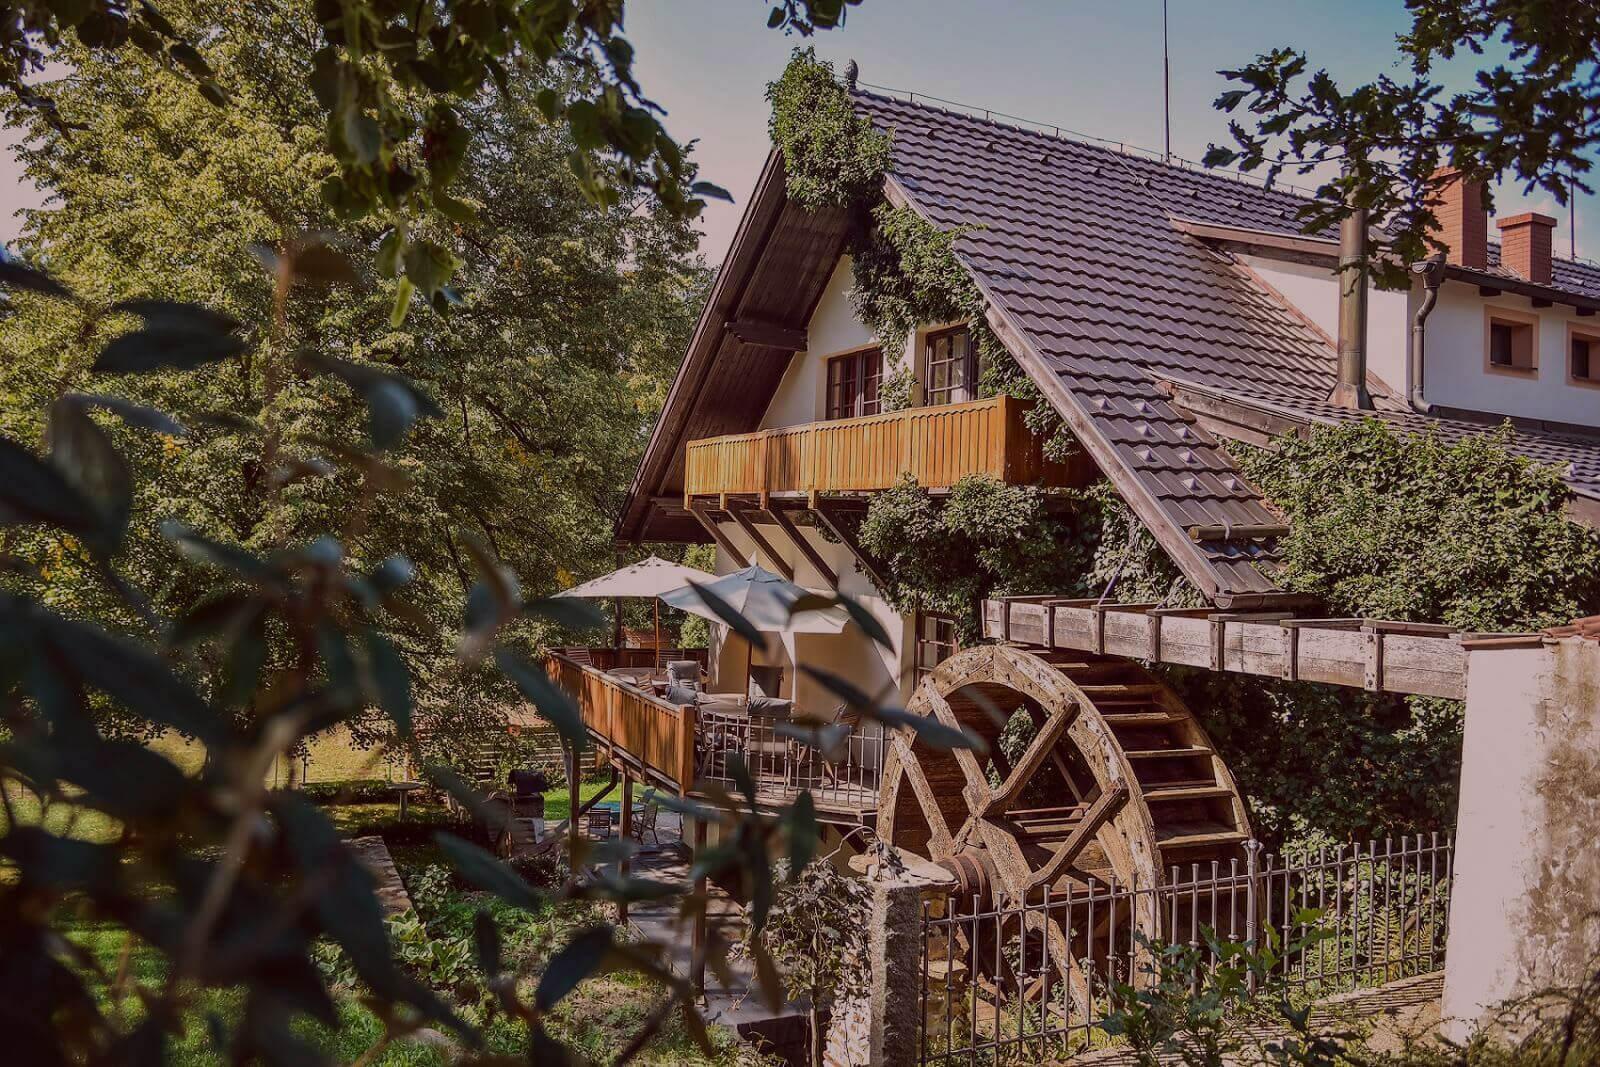 Klokočkův mlýn